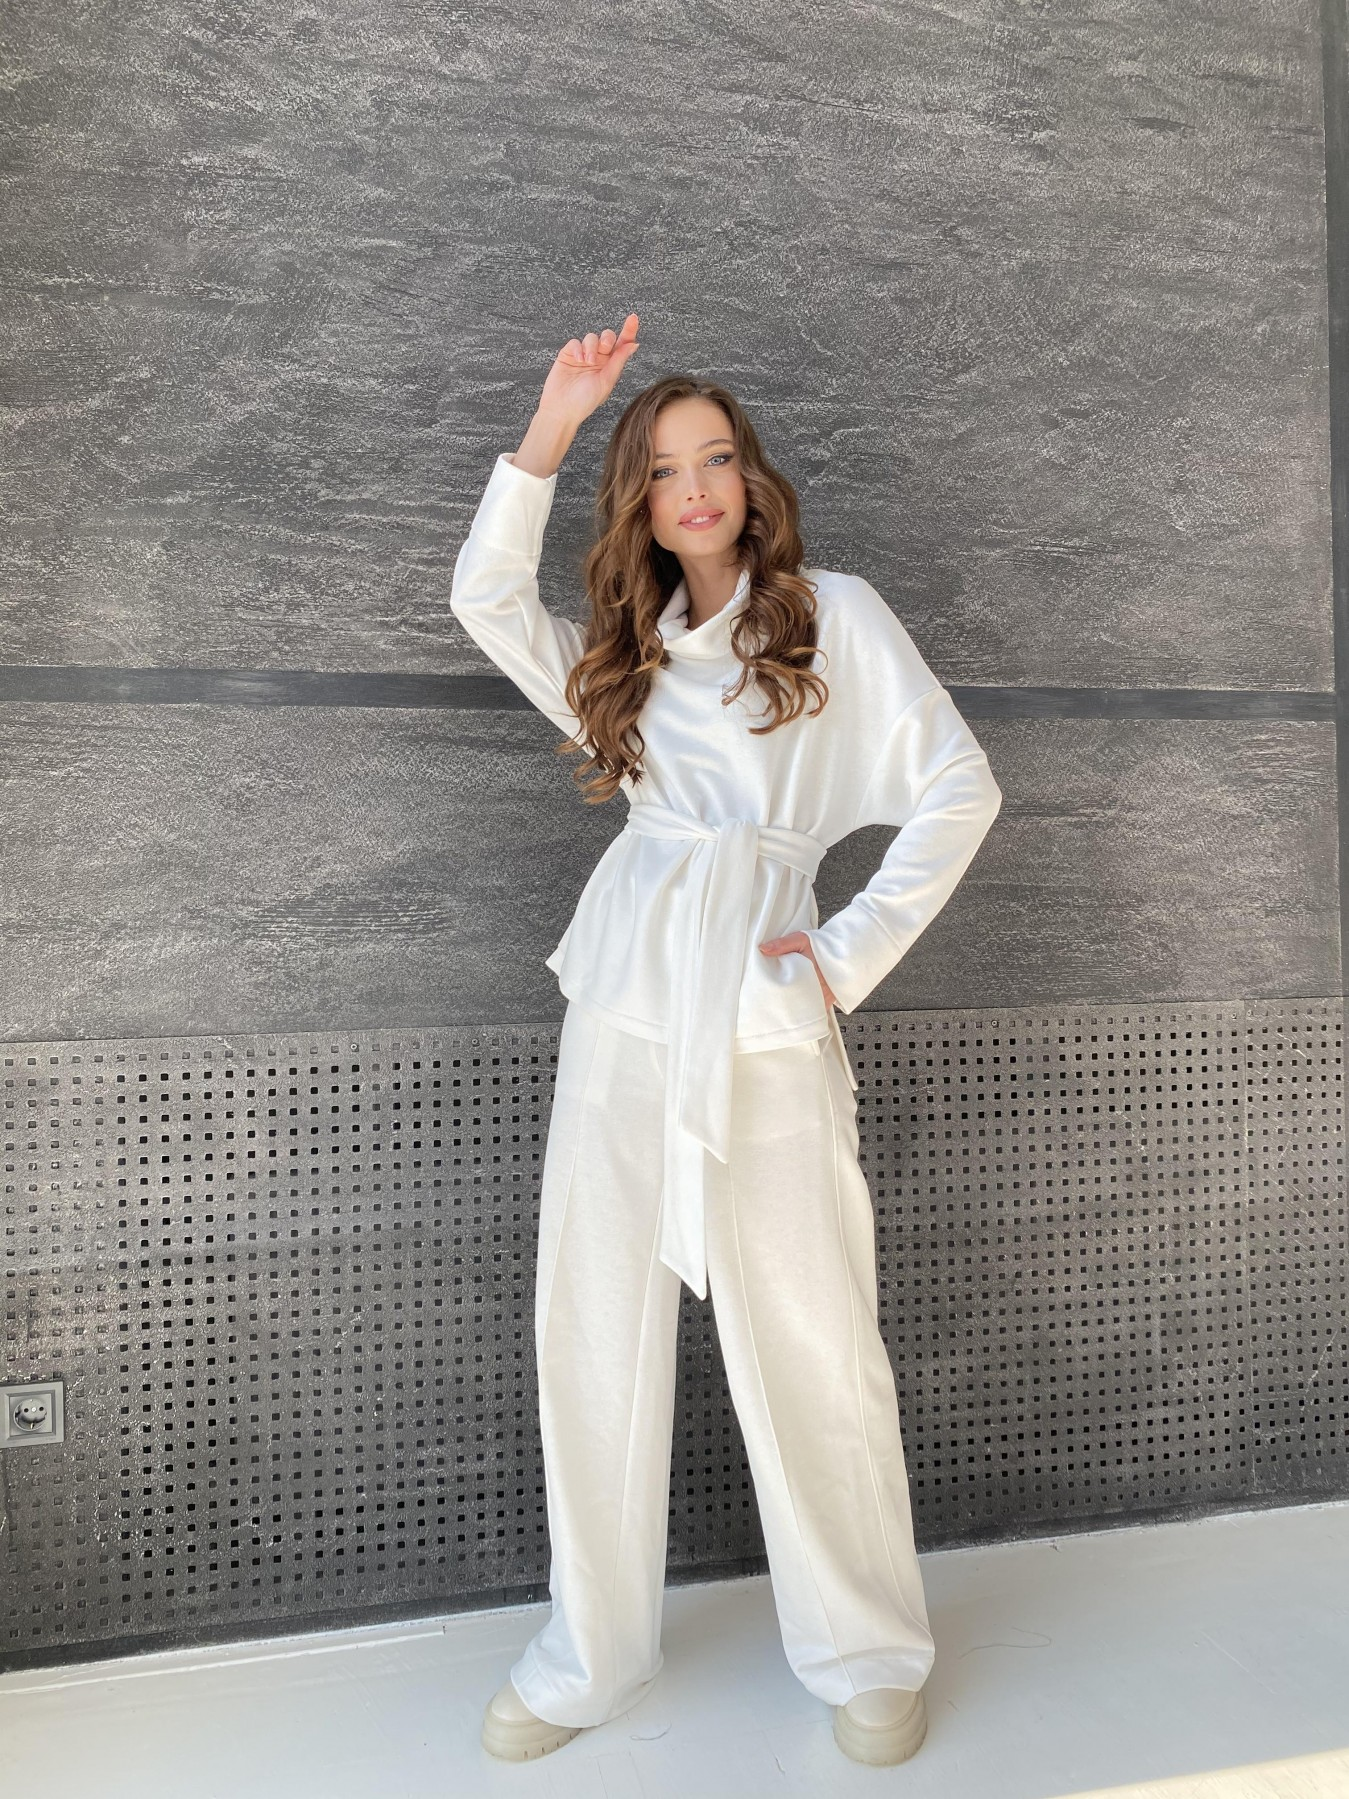 Джаст костюм Oversize  3х нитка 10564 АРТ. 47240 Цвет: Молоко - фото 7, интернет магазин tm-modus.ru